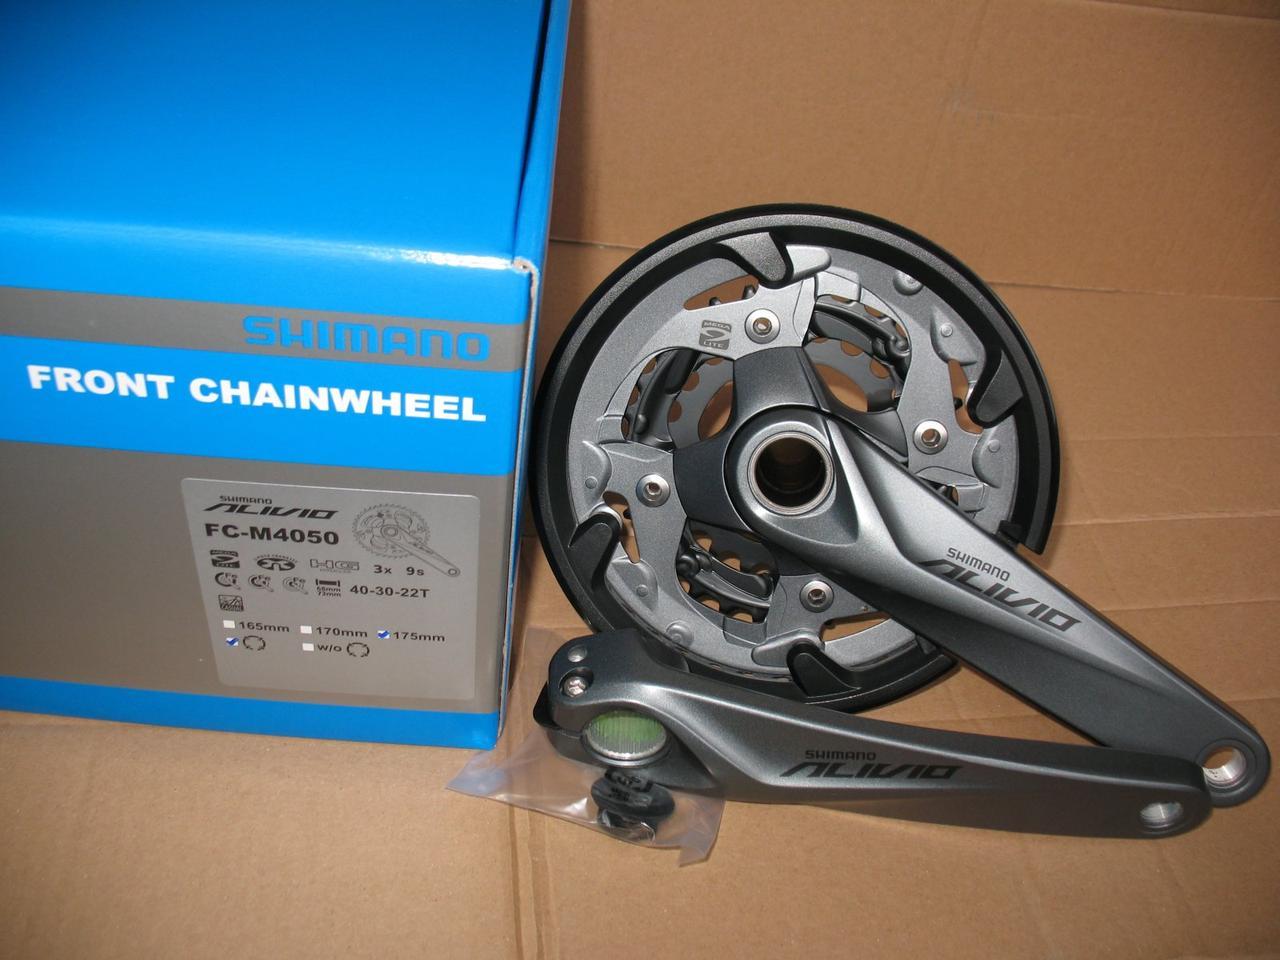 Shimano Alivio Fc M4050 40 30 22t 175mm W Cg Crankset 40t